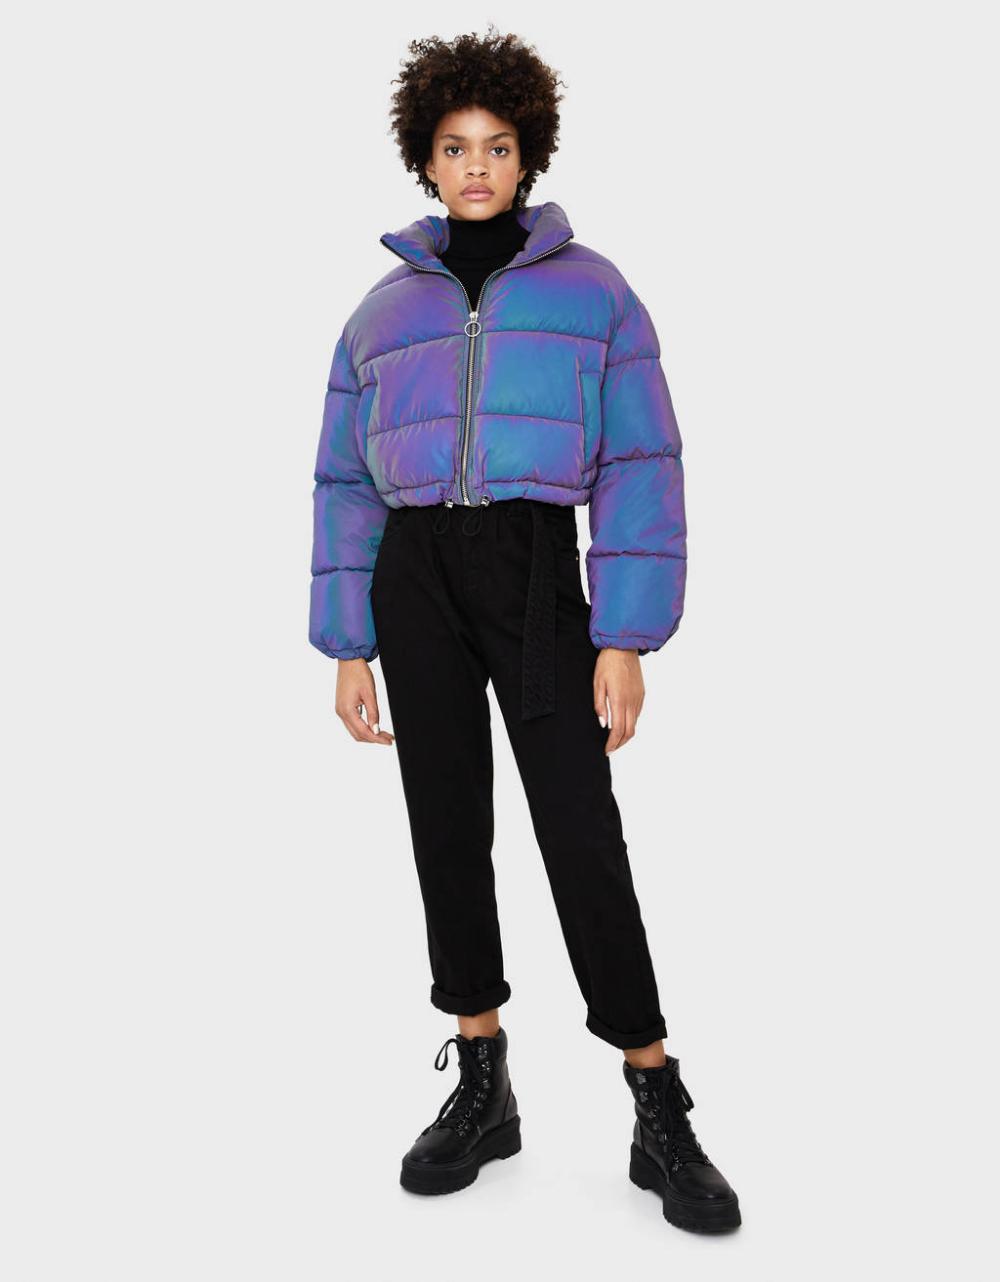 Reflective Puffer Jacket Gift Guide Bershka United Kingdom Puffer Jacket Women Puffer Jacket Outfit Bershka Jacket [ 1282 x 1000 Pixel ]